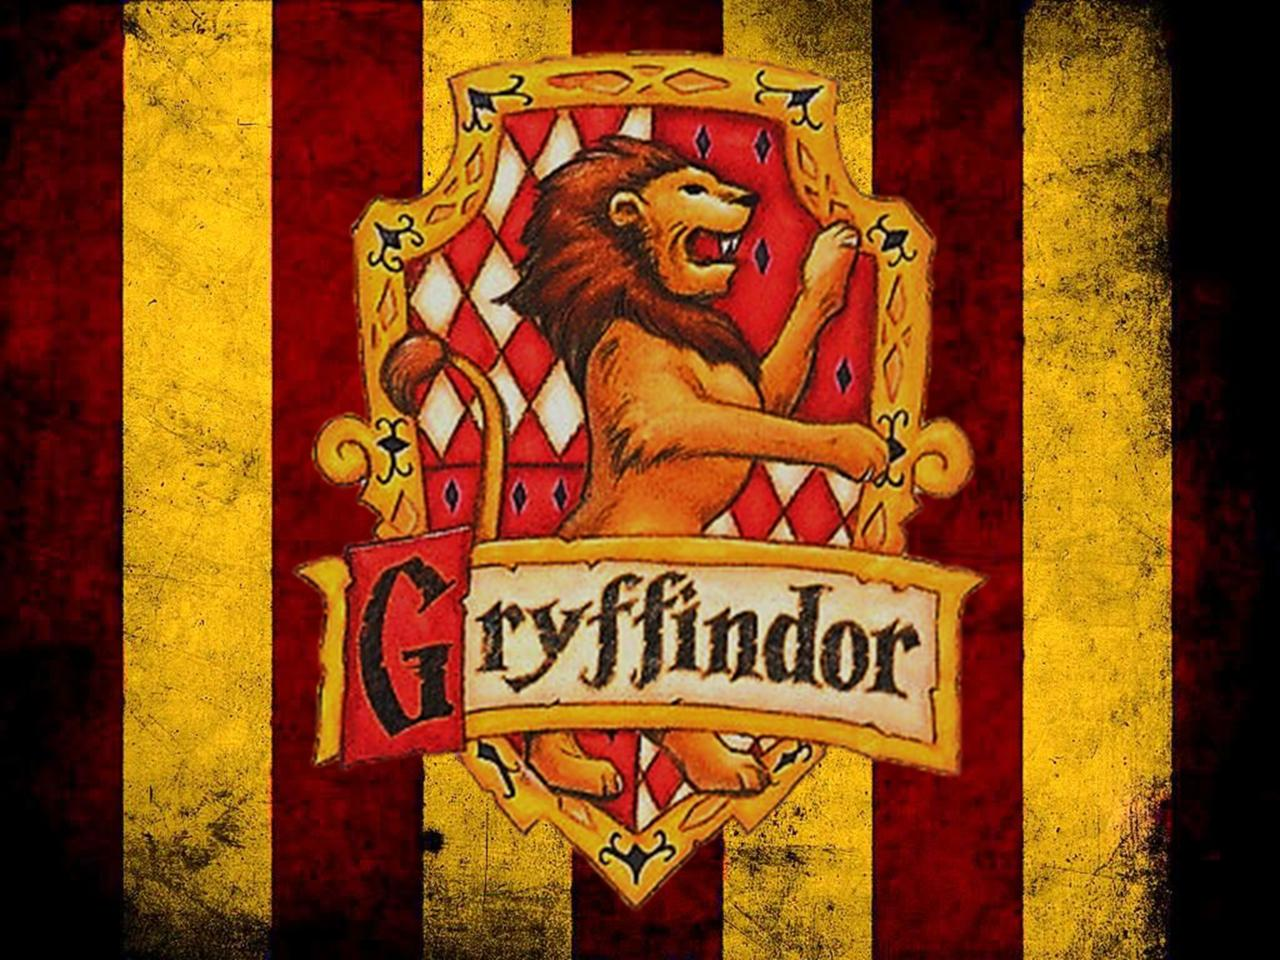 No Name] (Gryffindor) | Hogwarts is Here